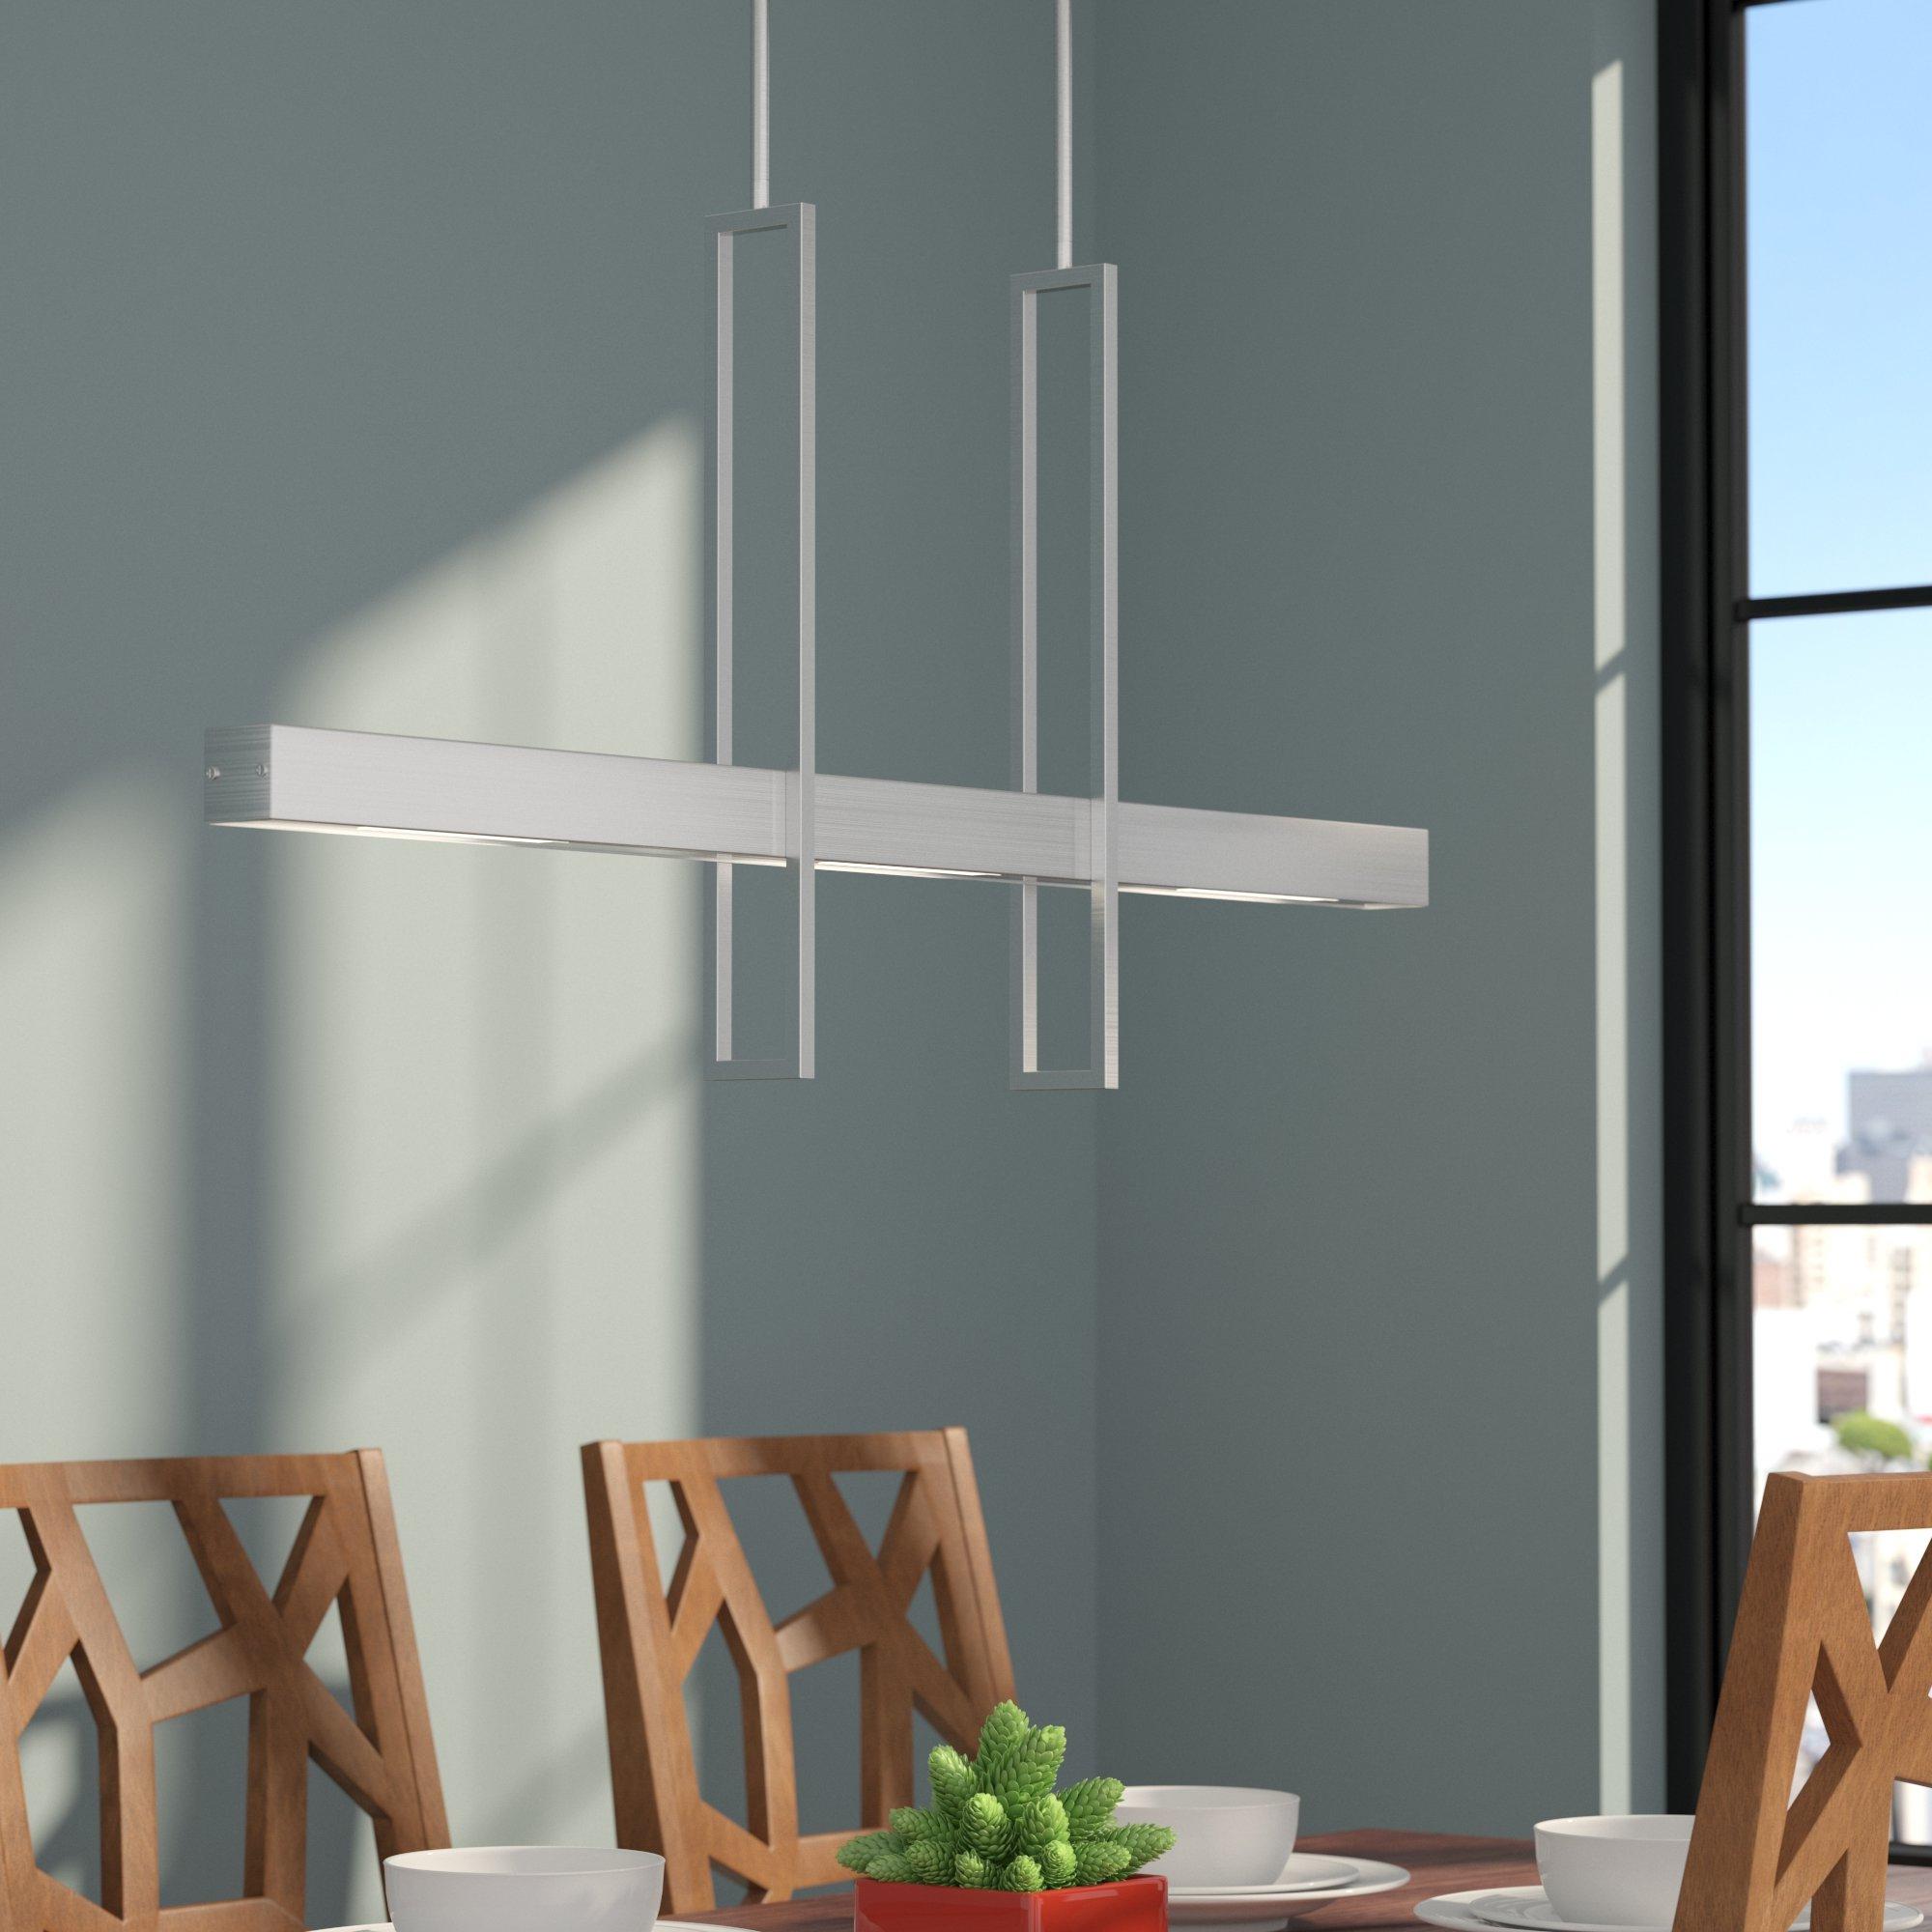 Callington 2 Light Led Kitchen Island Linear Pendant Inside Latest Callington 1 Light Led Single Geometric Pendants (View 3 of 25)